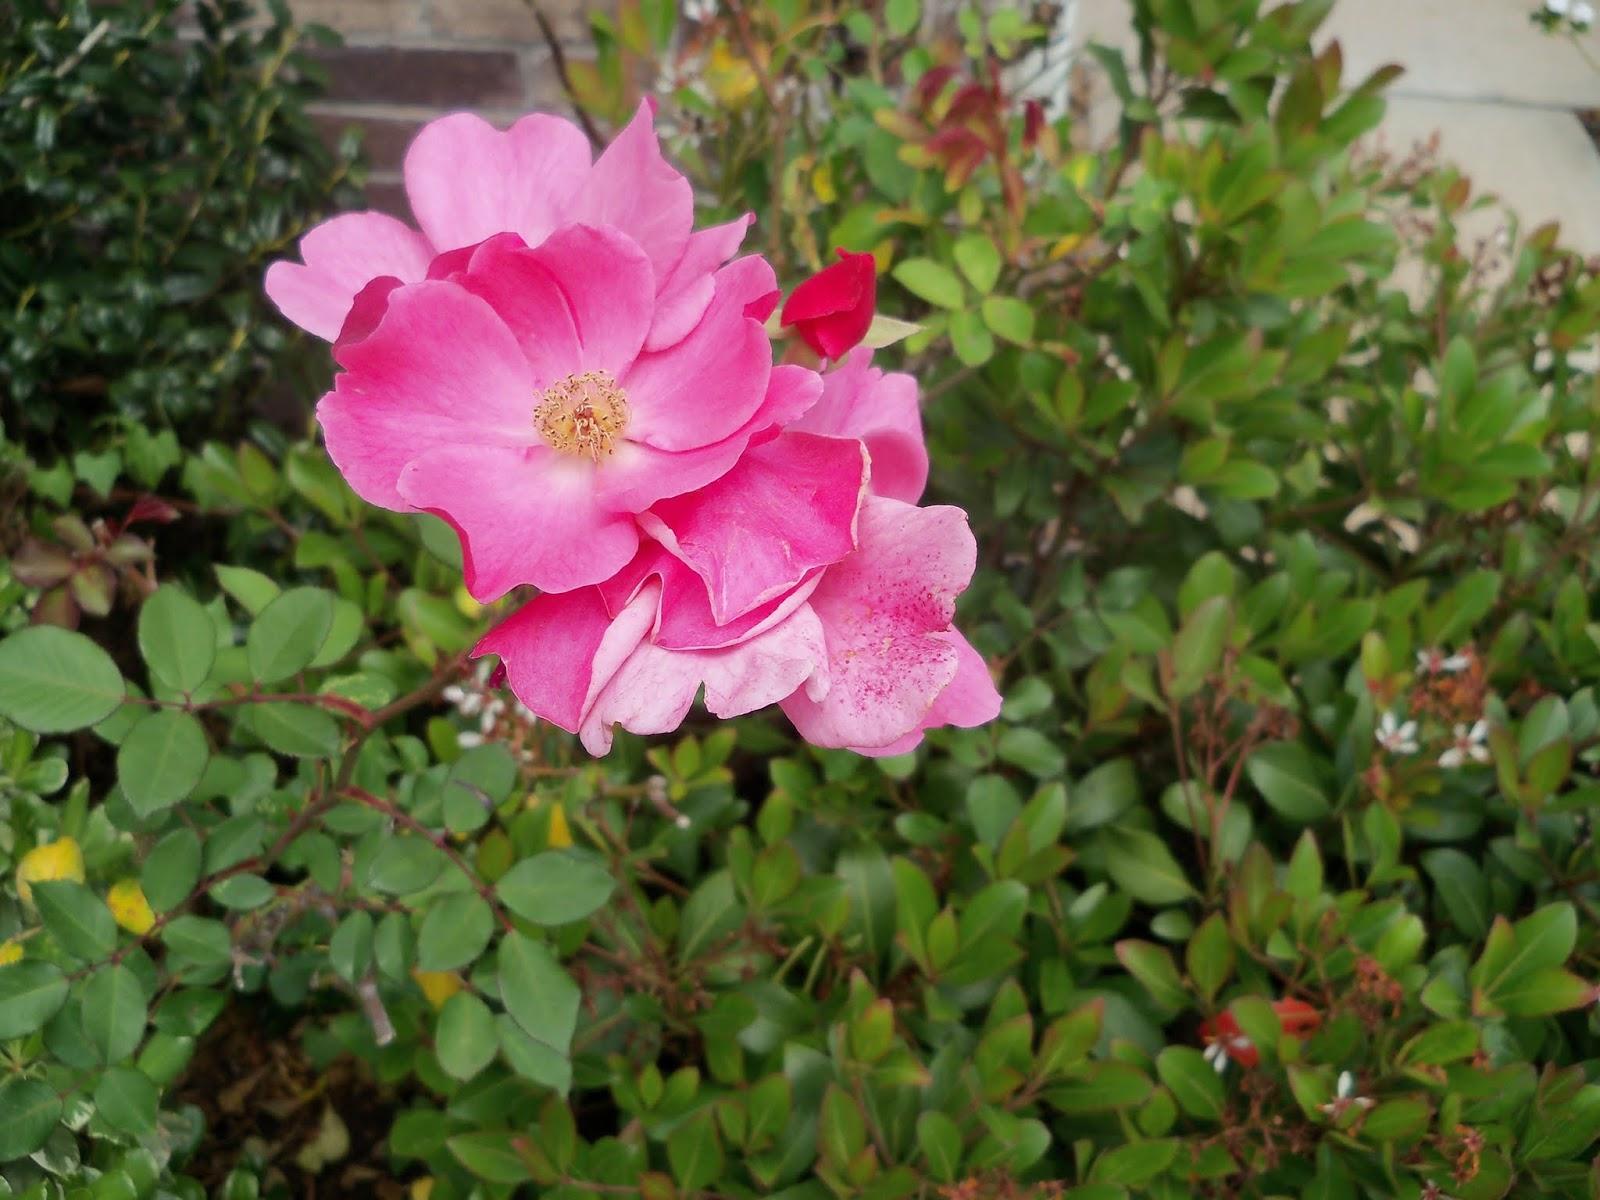 Gardening 2013 - 115_5723.JPG